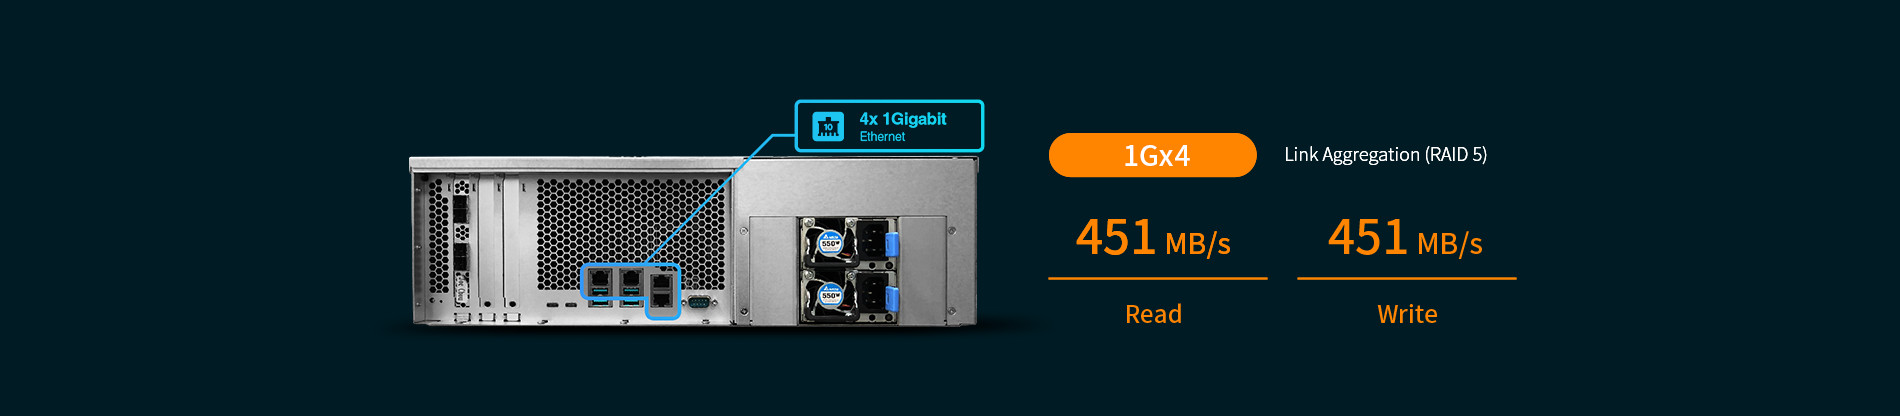 network attached storage 3u rack, 16hdd bay, 2x m.2 slot asustor lockerstor 16r pro as7116rdx 12